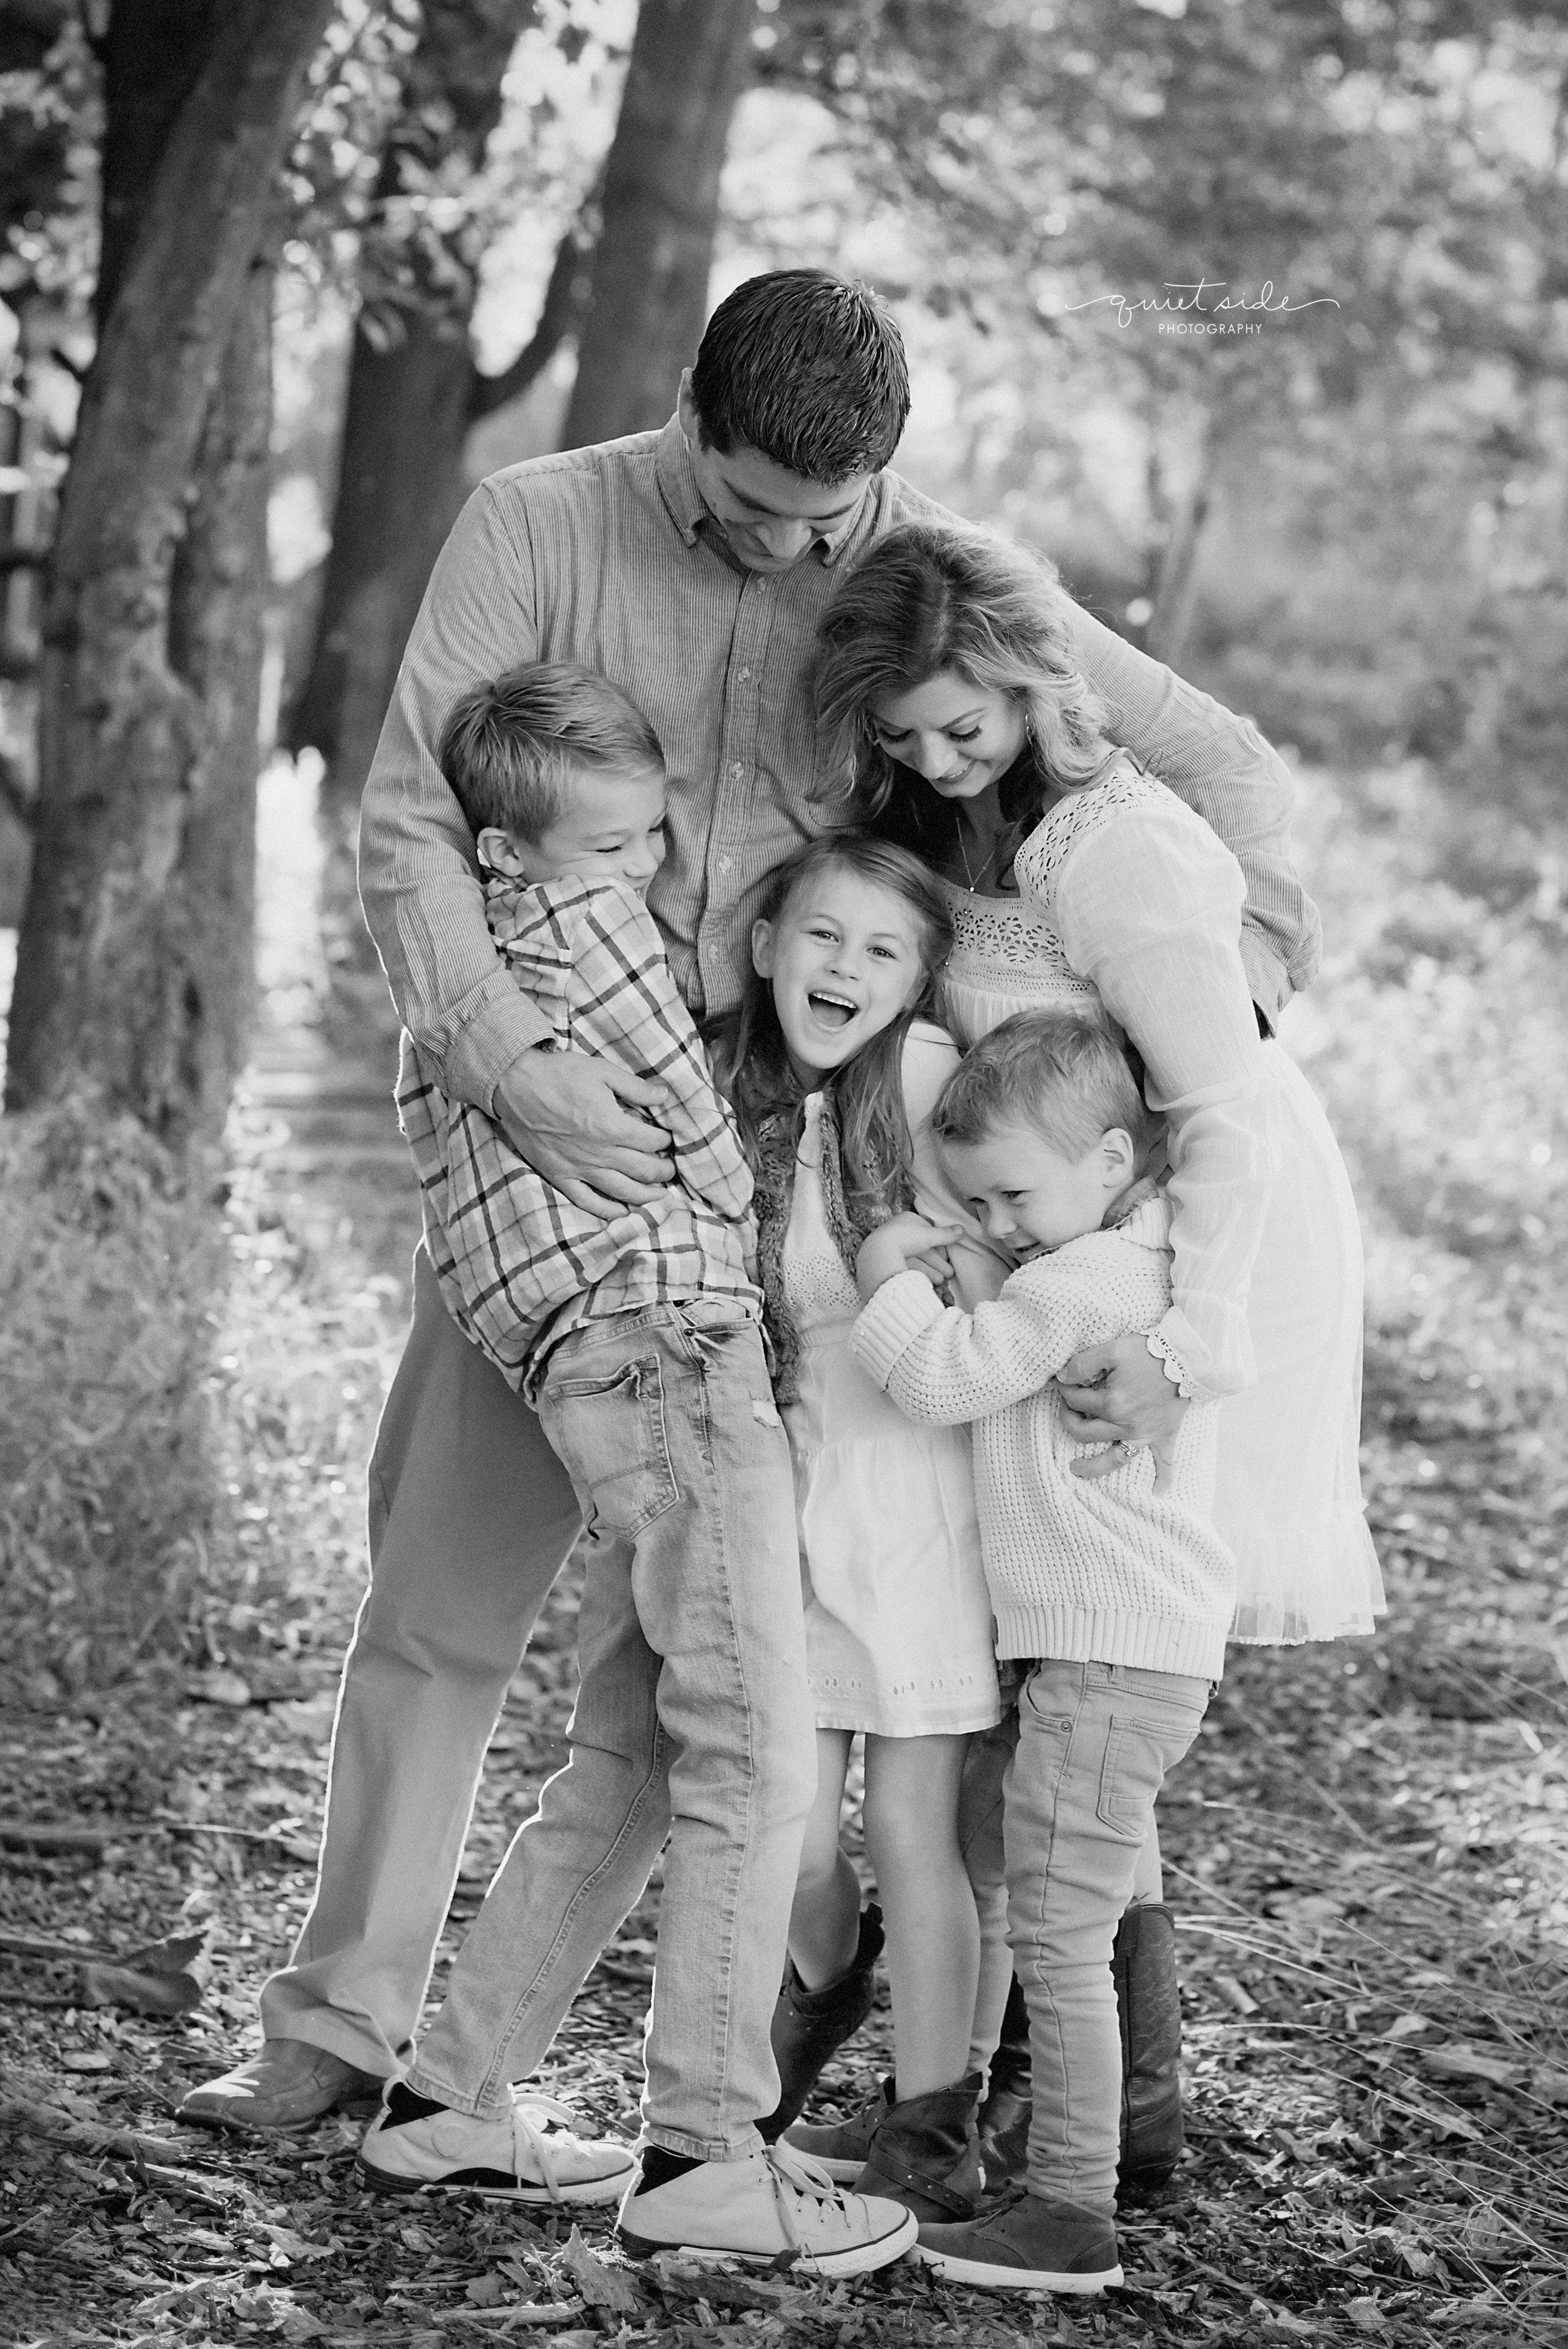 QuietSidePhotography-Purcellville, VA- Family-Photographer-Motherhood-Familyof5-SilverbrookFarm-GoldenHour-Sunset-Family-blackandwhite-Loudoun County-Virginia-MIlesFamily.jpg